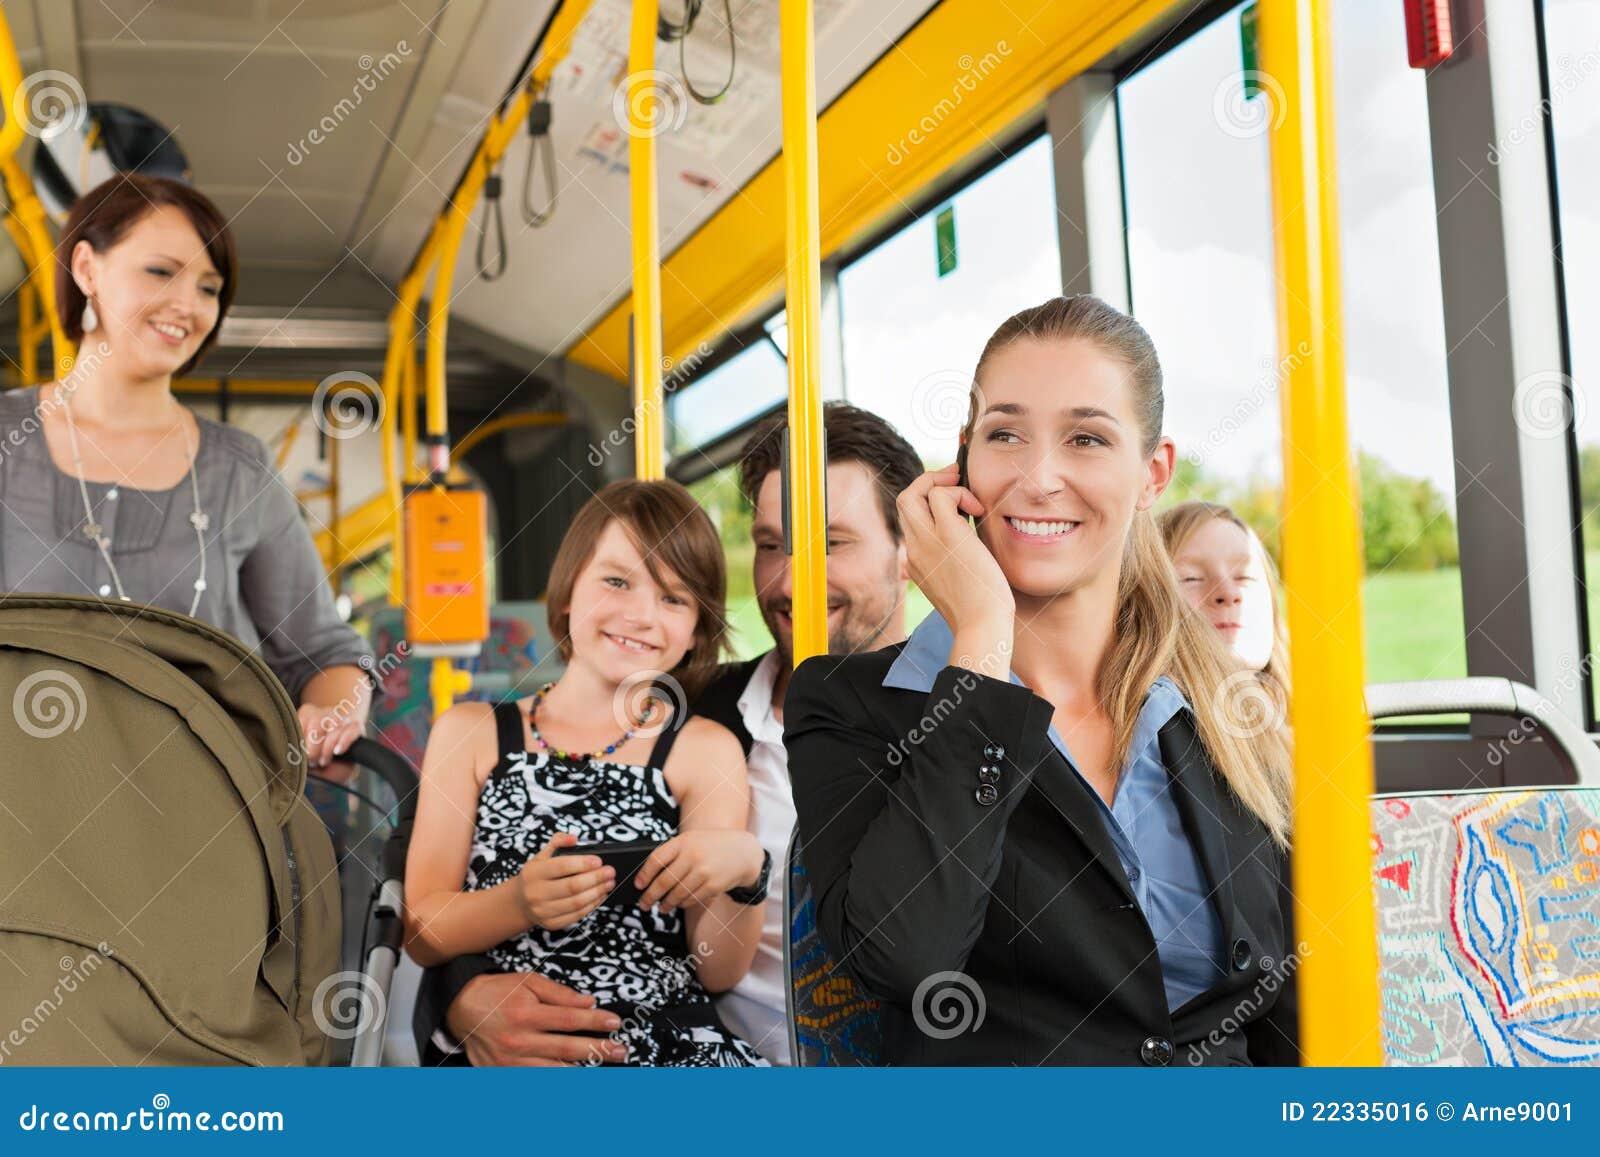 Чулки в автобусе 10 фотография